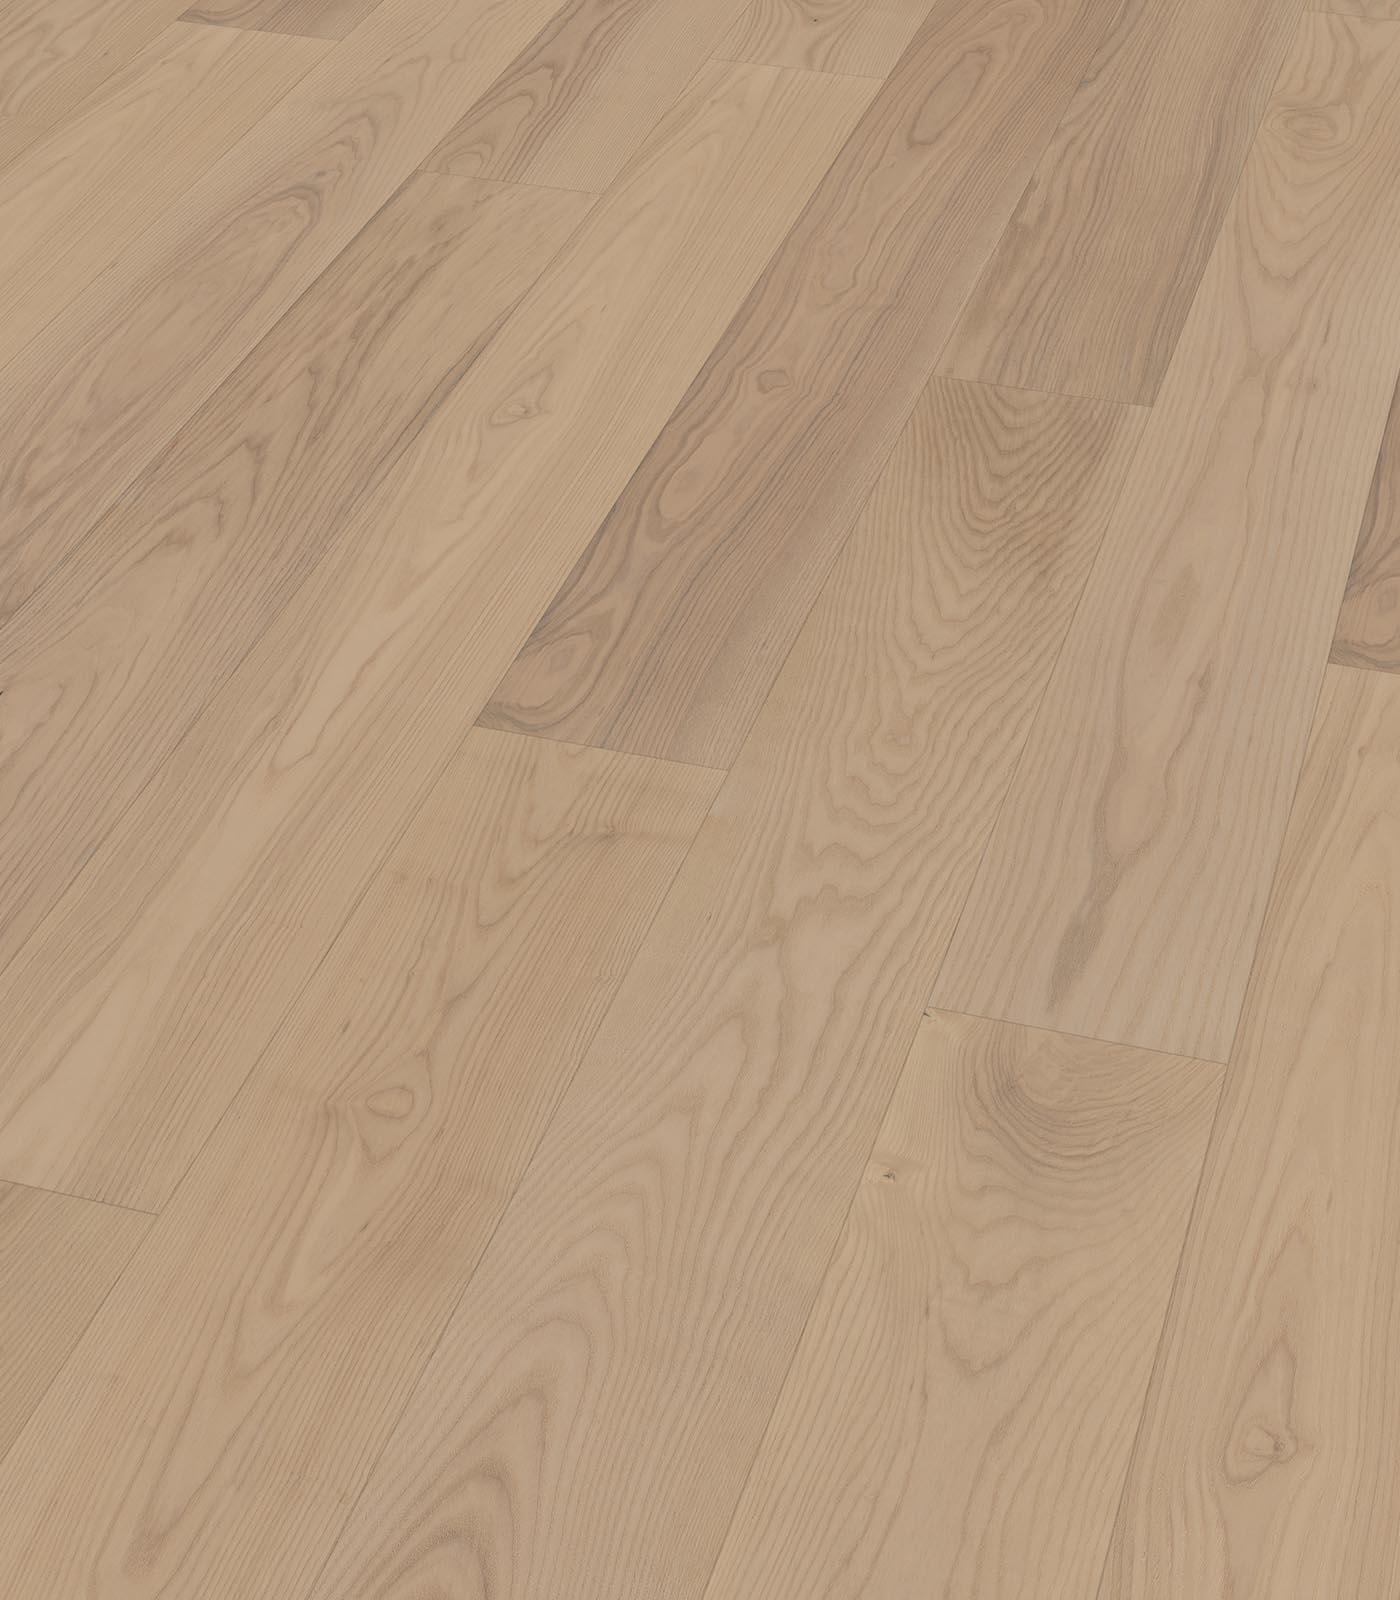 Belgrade-After Oak Collection-European Ash Floors - angle